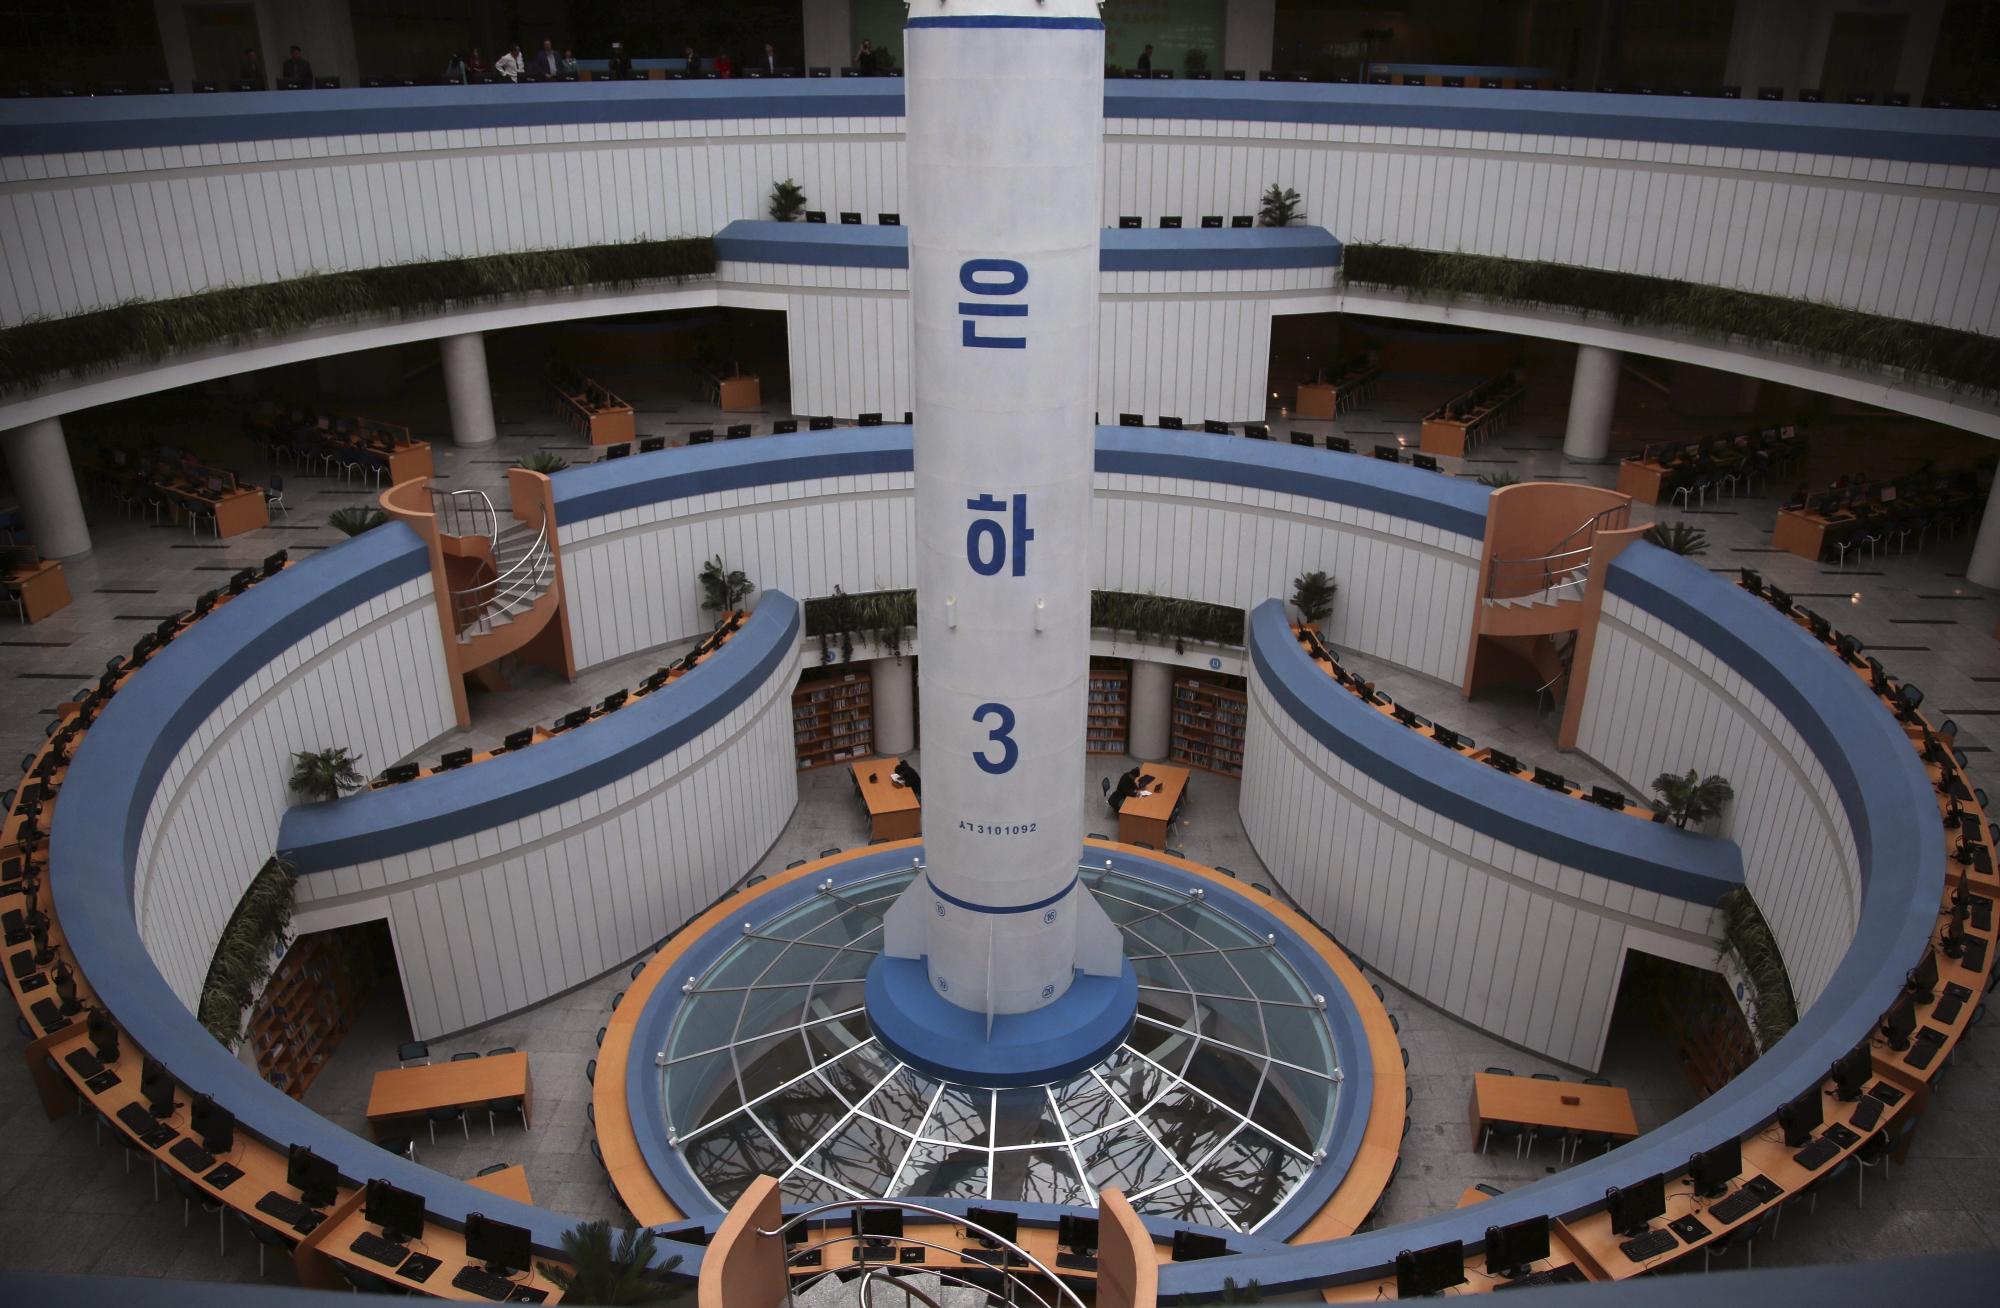 f-missile-a-20170419.1495062094.jpg